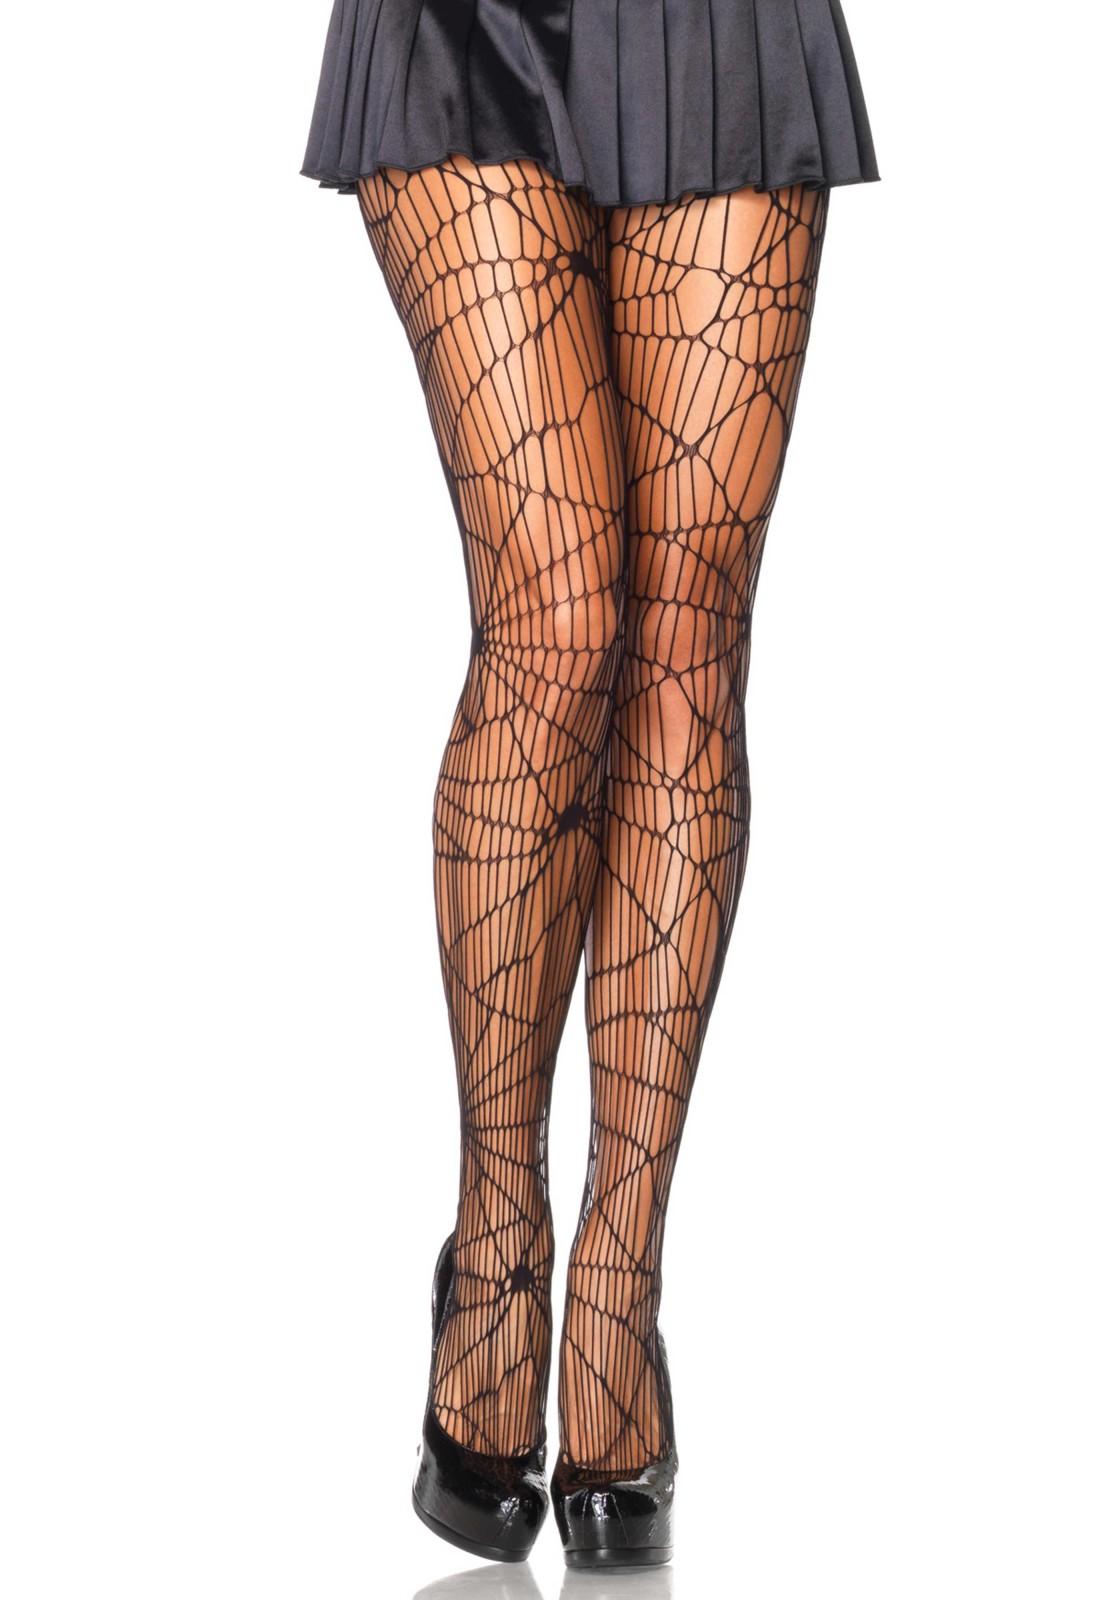 Distressed Net Pantyhose